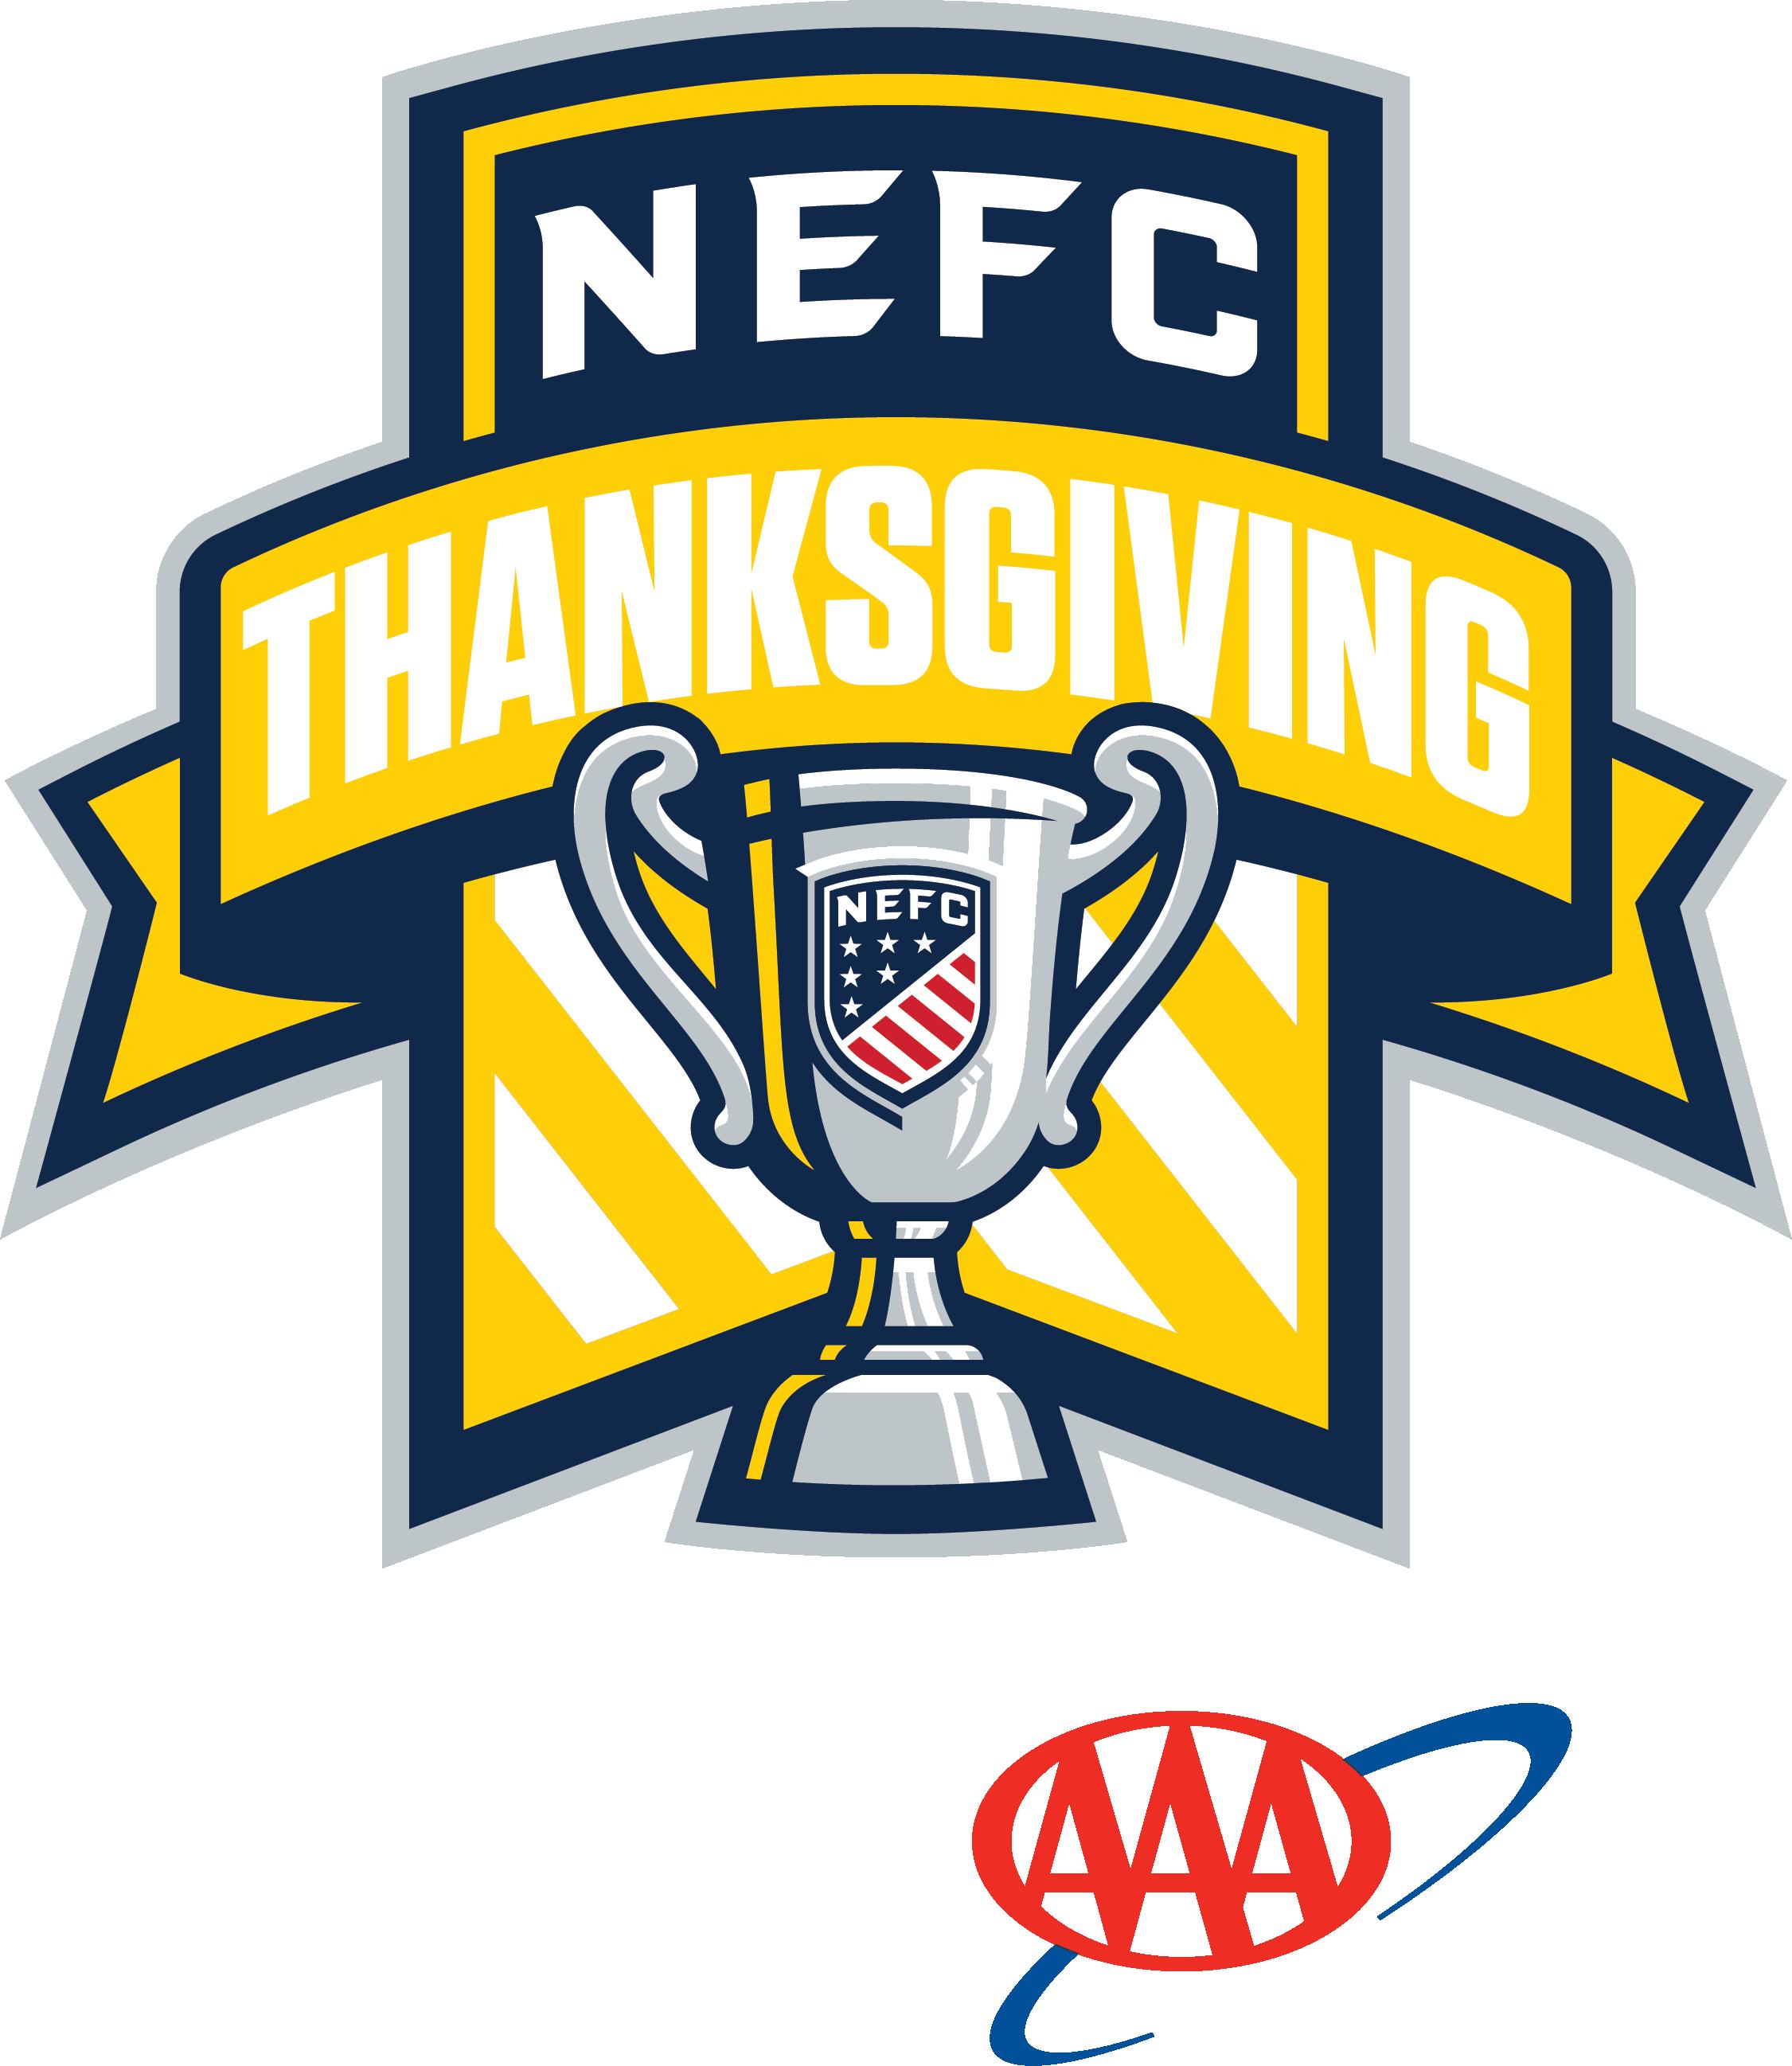 NEFC_Tournaments-Thanksgiving_AAA_KO_Sponsor